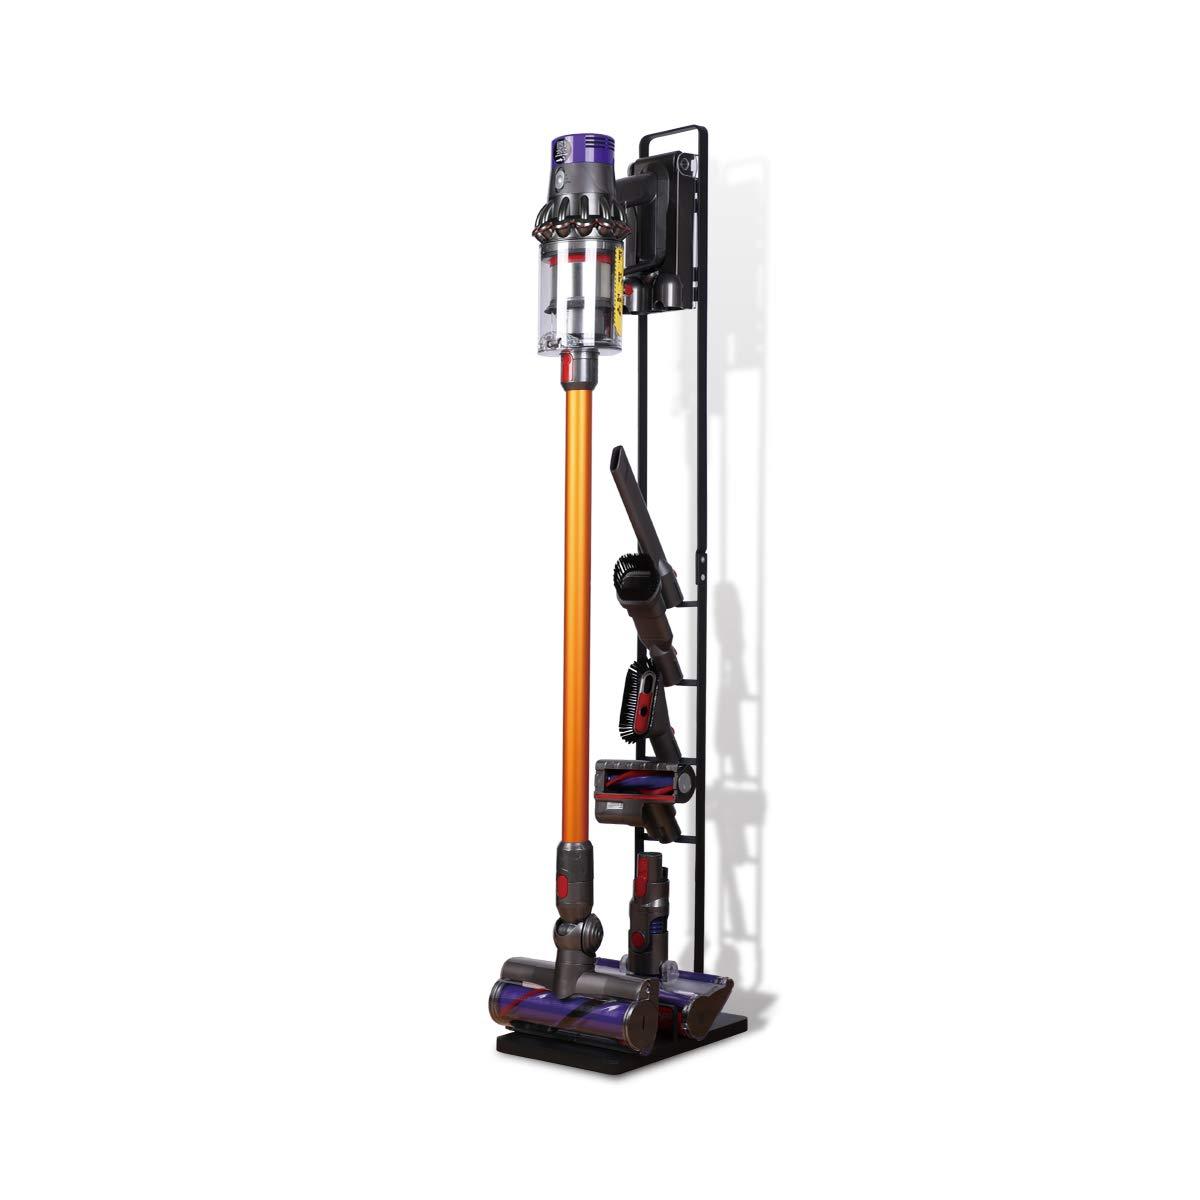 LANMU Storage Bracket Organizer Stand Holder Compatible with Dyson V6 V7 V8 V10 DC30 DC31 DC34 DC35 DC58 DC59 DC62 DC74 Cordless Vacuum Cleaners